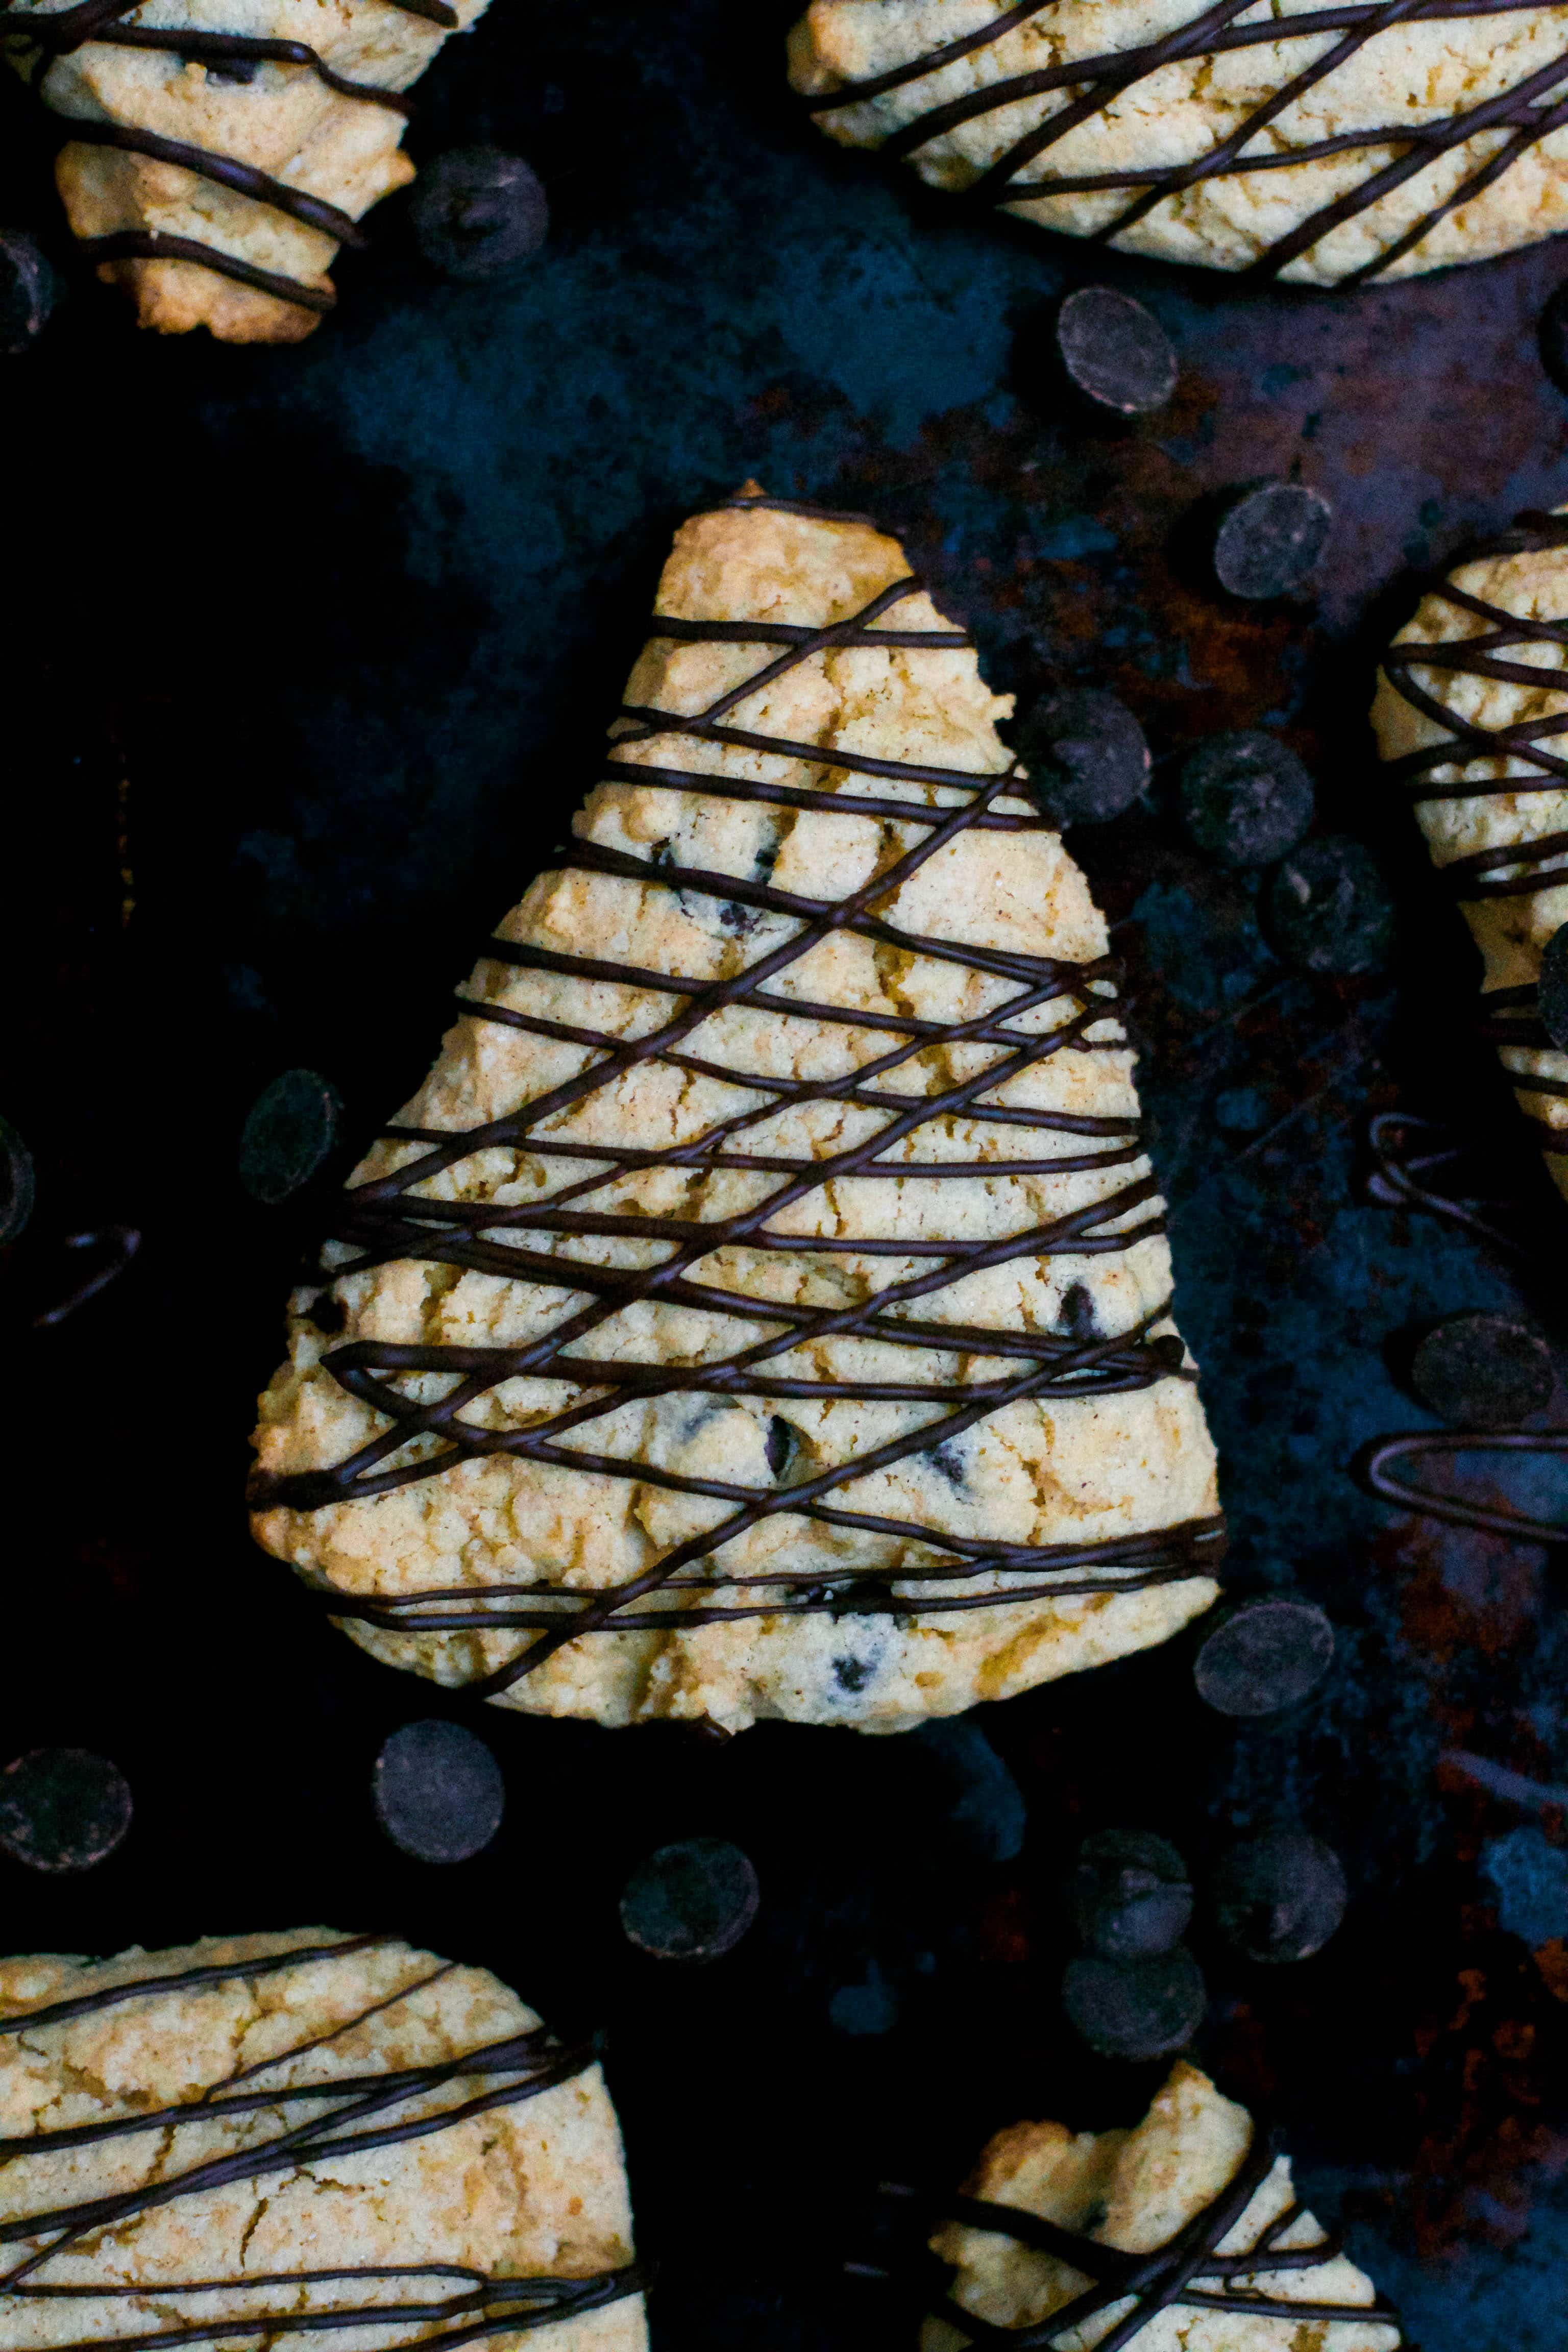 Gluten-Free Vegan Chocolate Chip Scones (GF, DF, V) - A Dash of Megnut